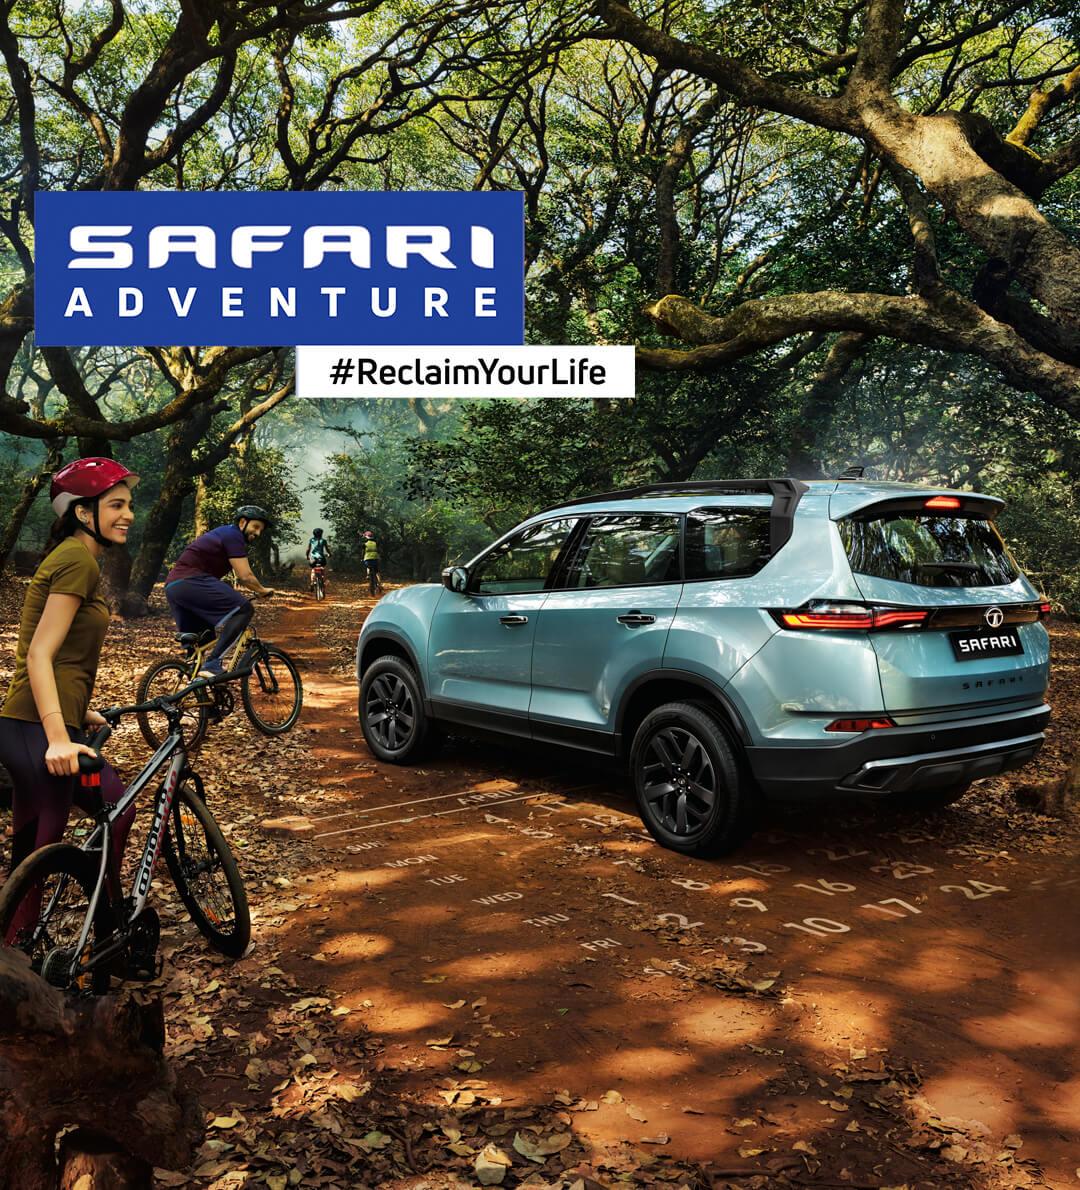 Tata Safari Adventure Persona Explore New Features Specifications More